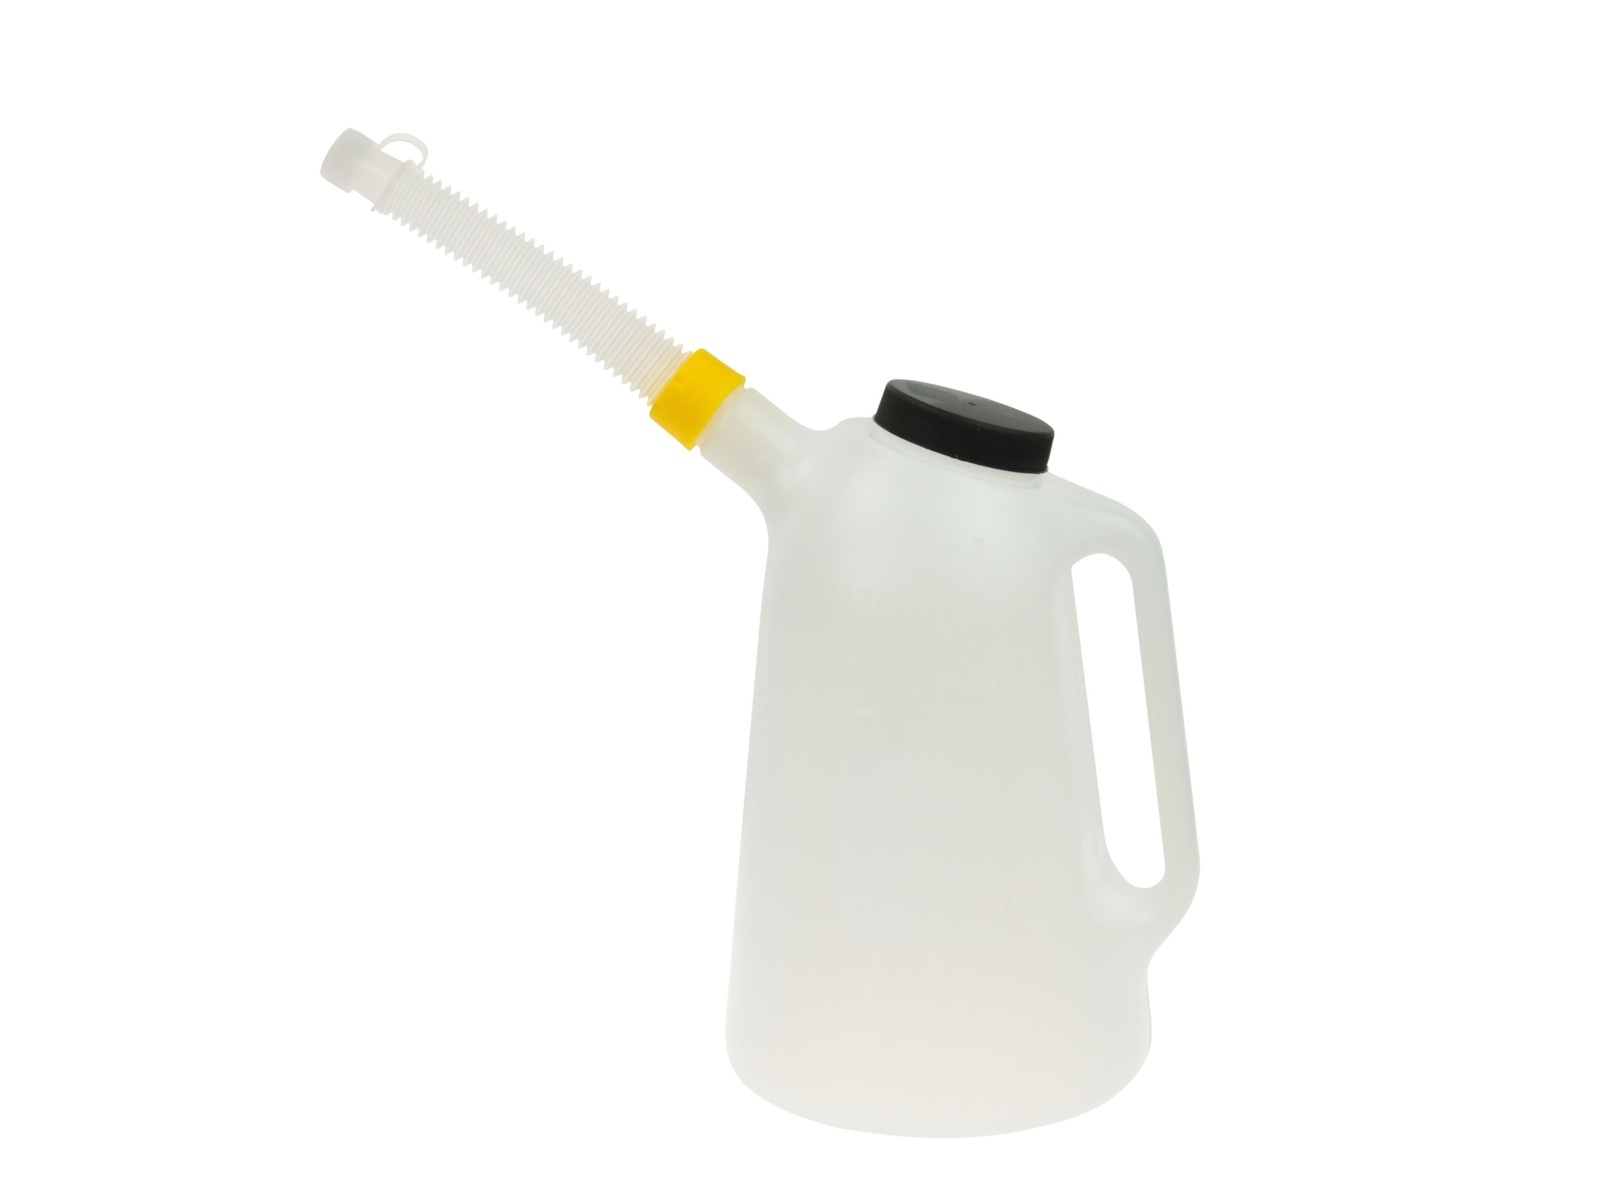 Nádoba na olej 3 l, konev s hubicí